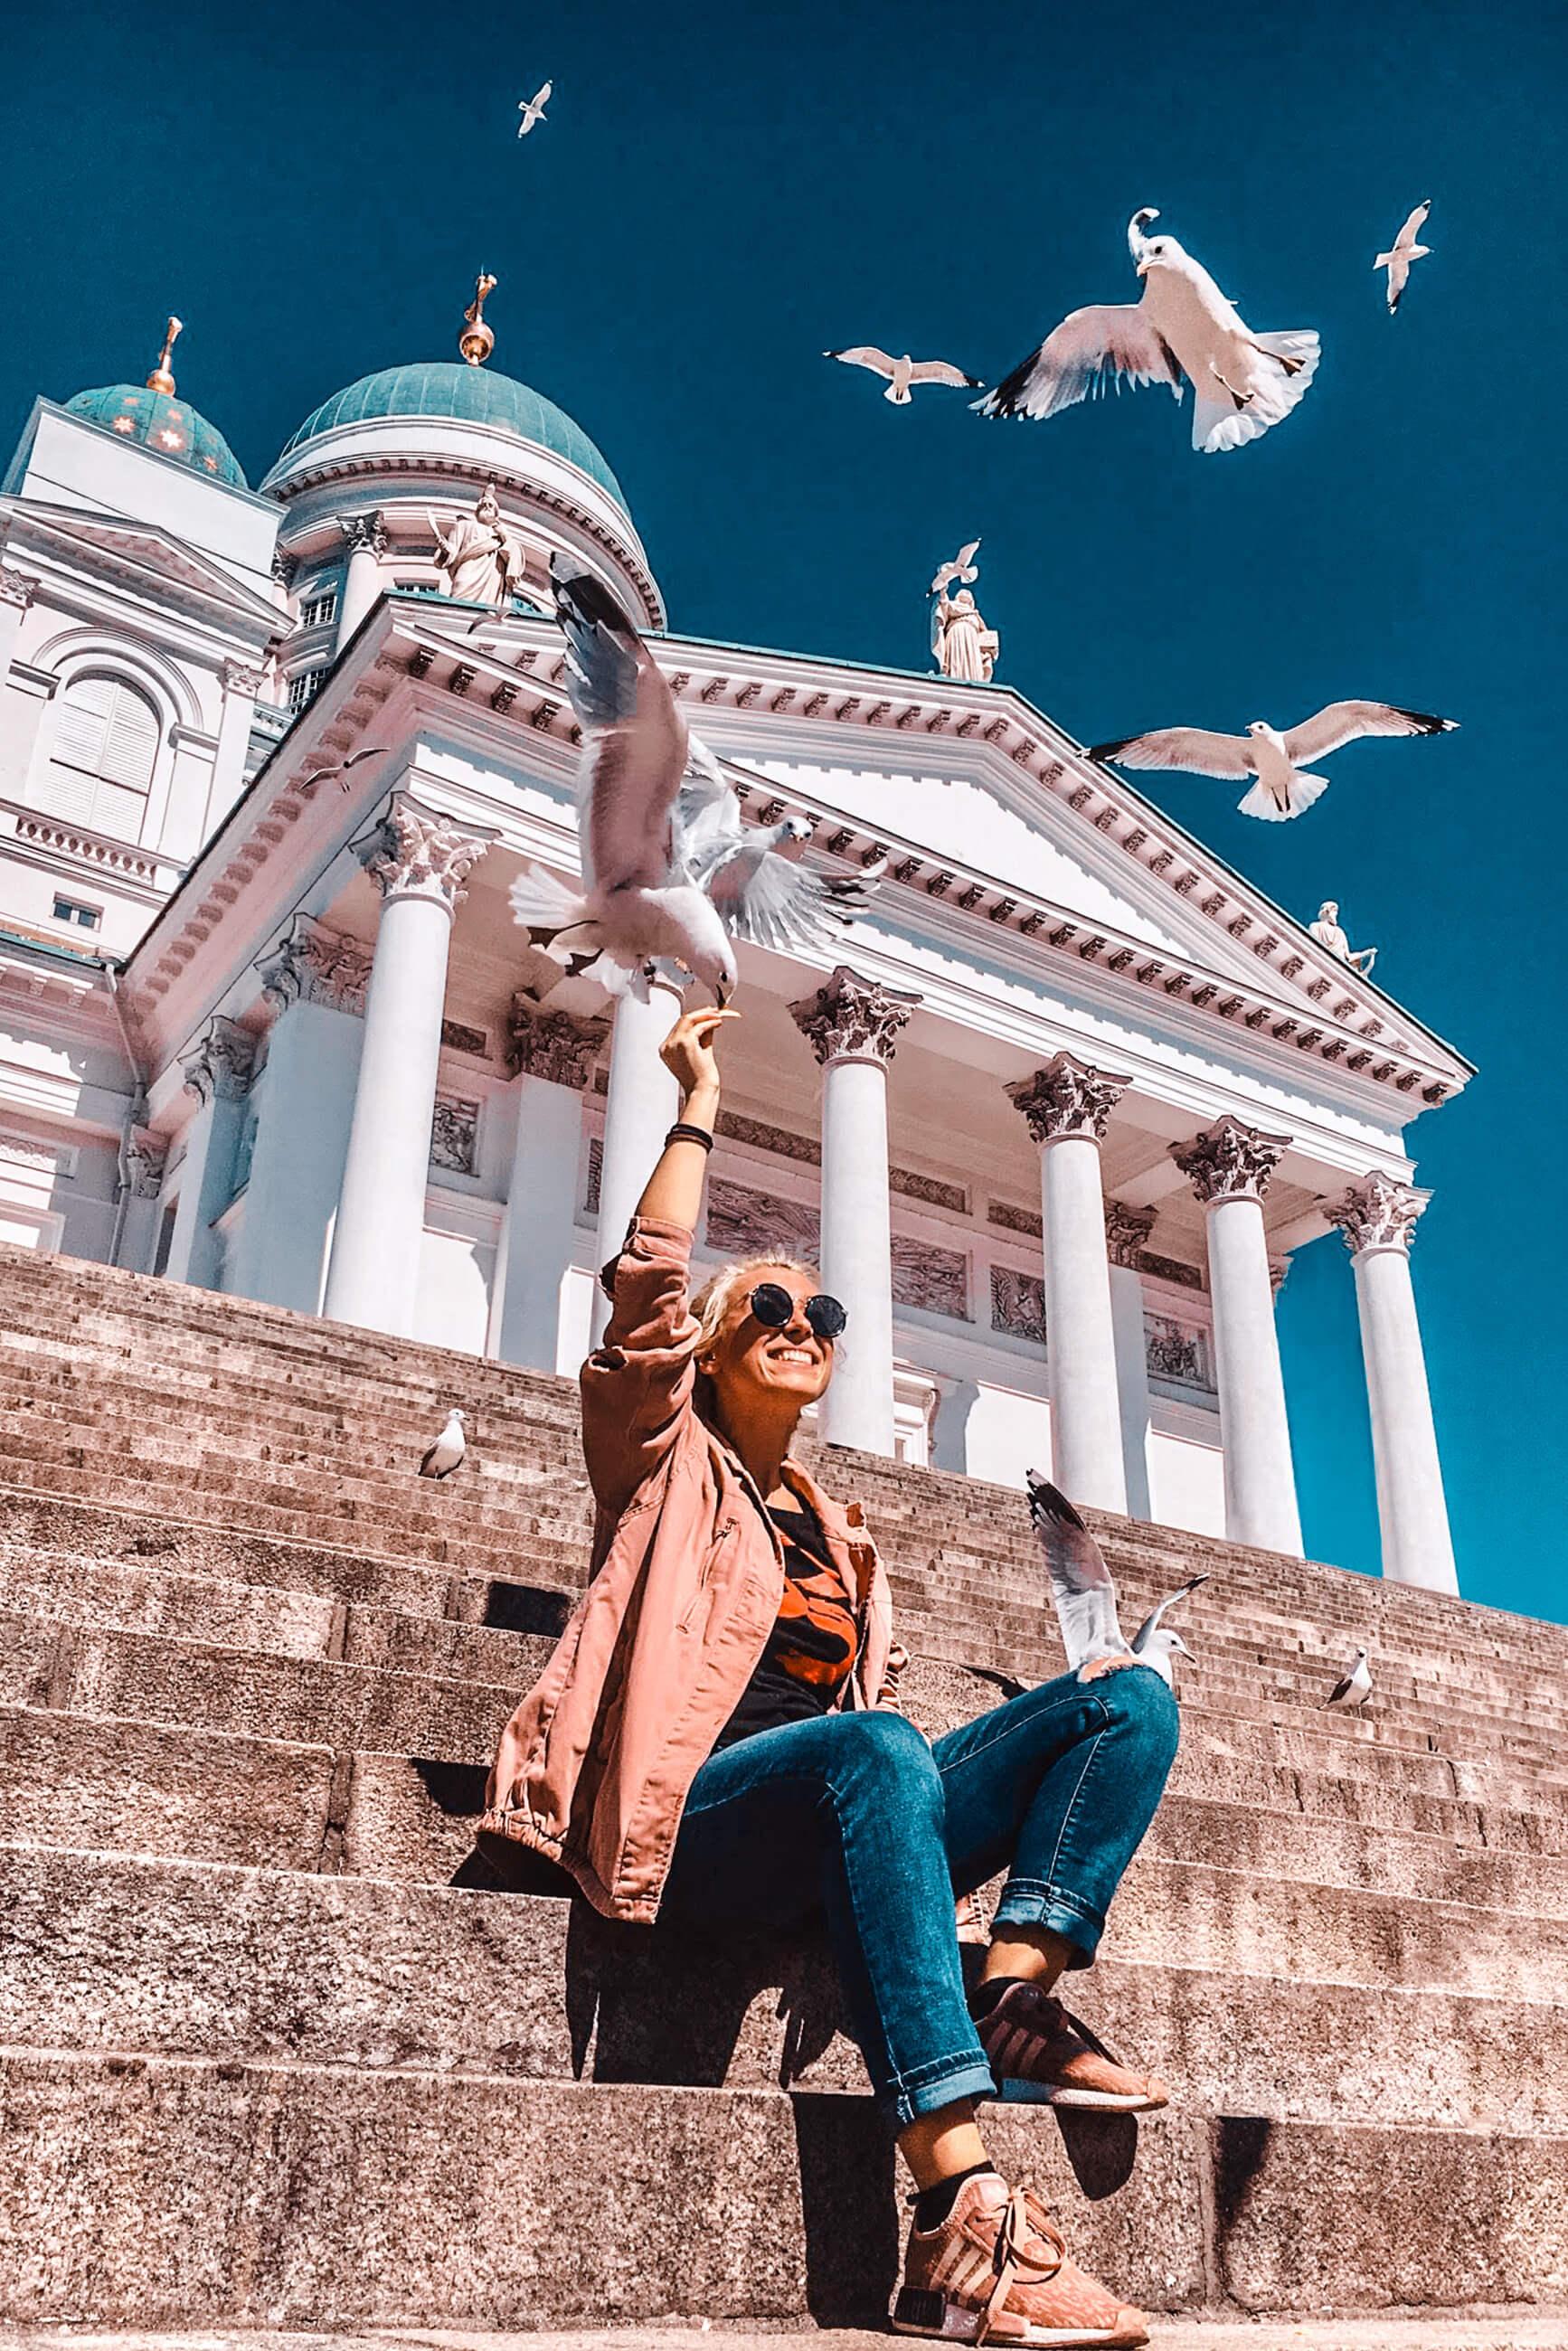 https://bubo.sk/uploads/galleries/7342/zuzkahabekova_finsko_helsinki-66.jpg